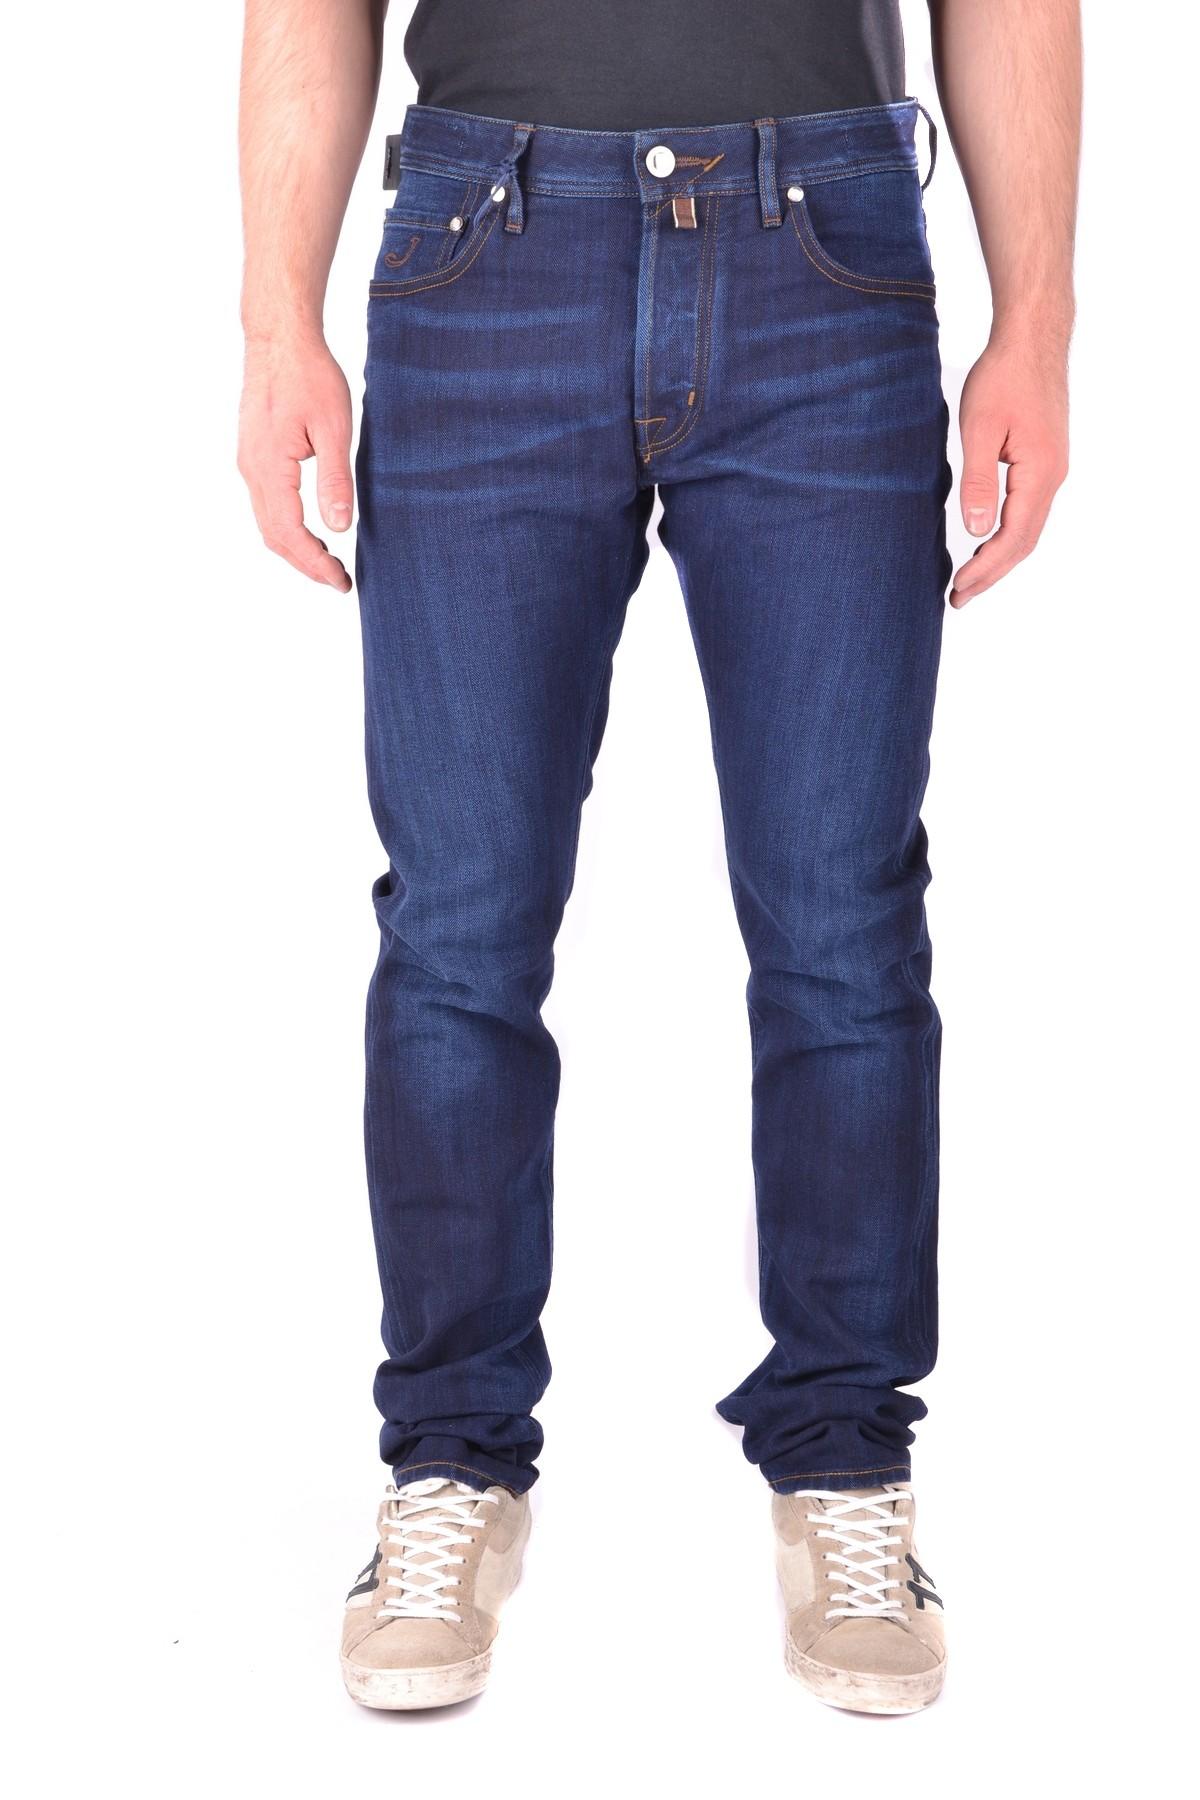 Jacob Cohen Jeans Muži